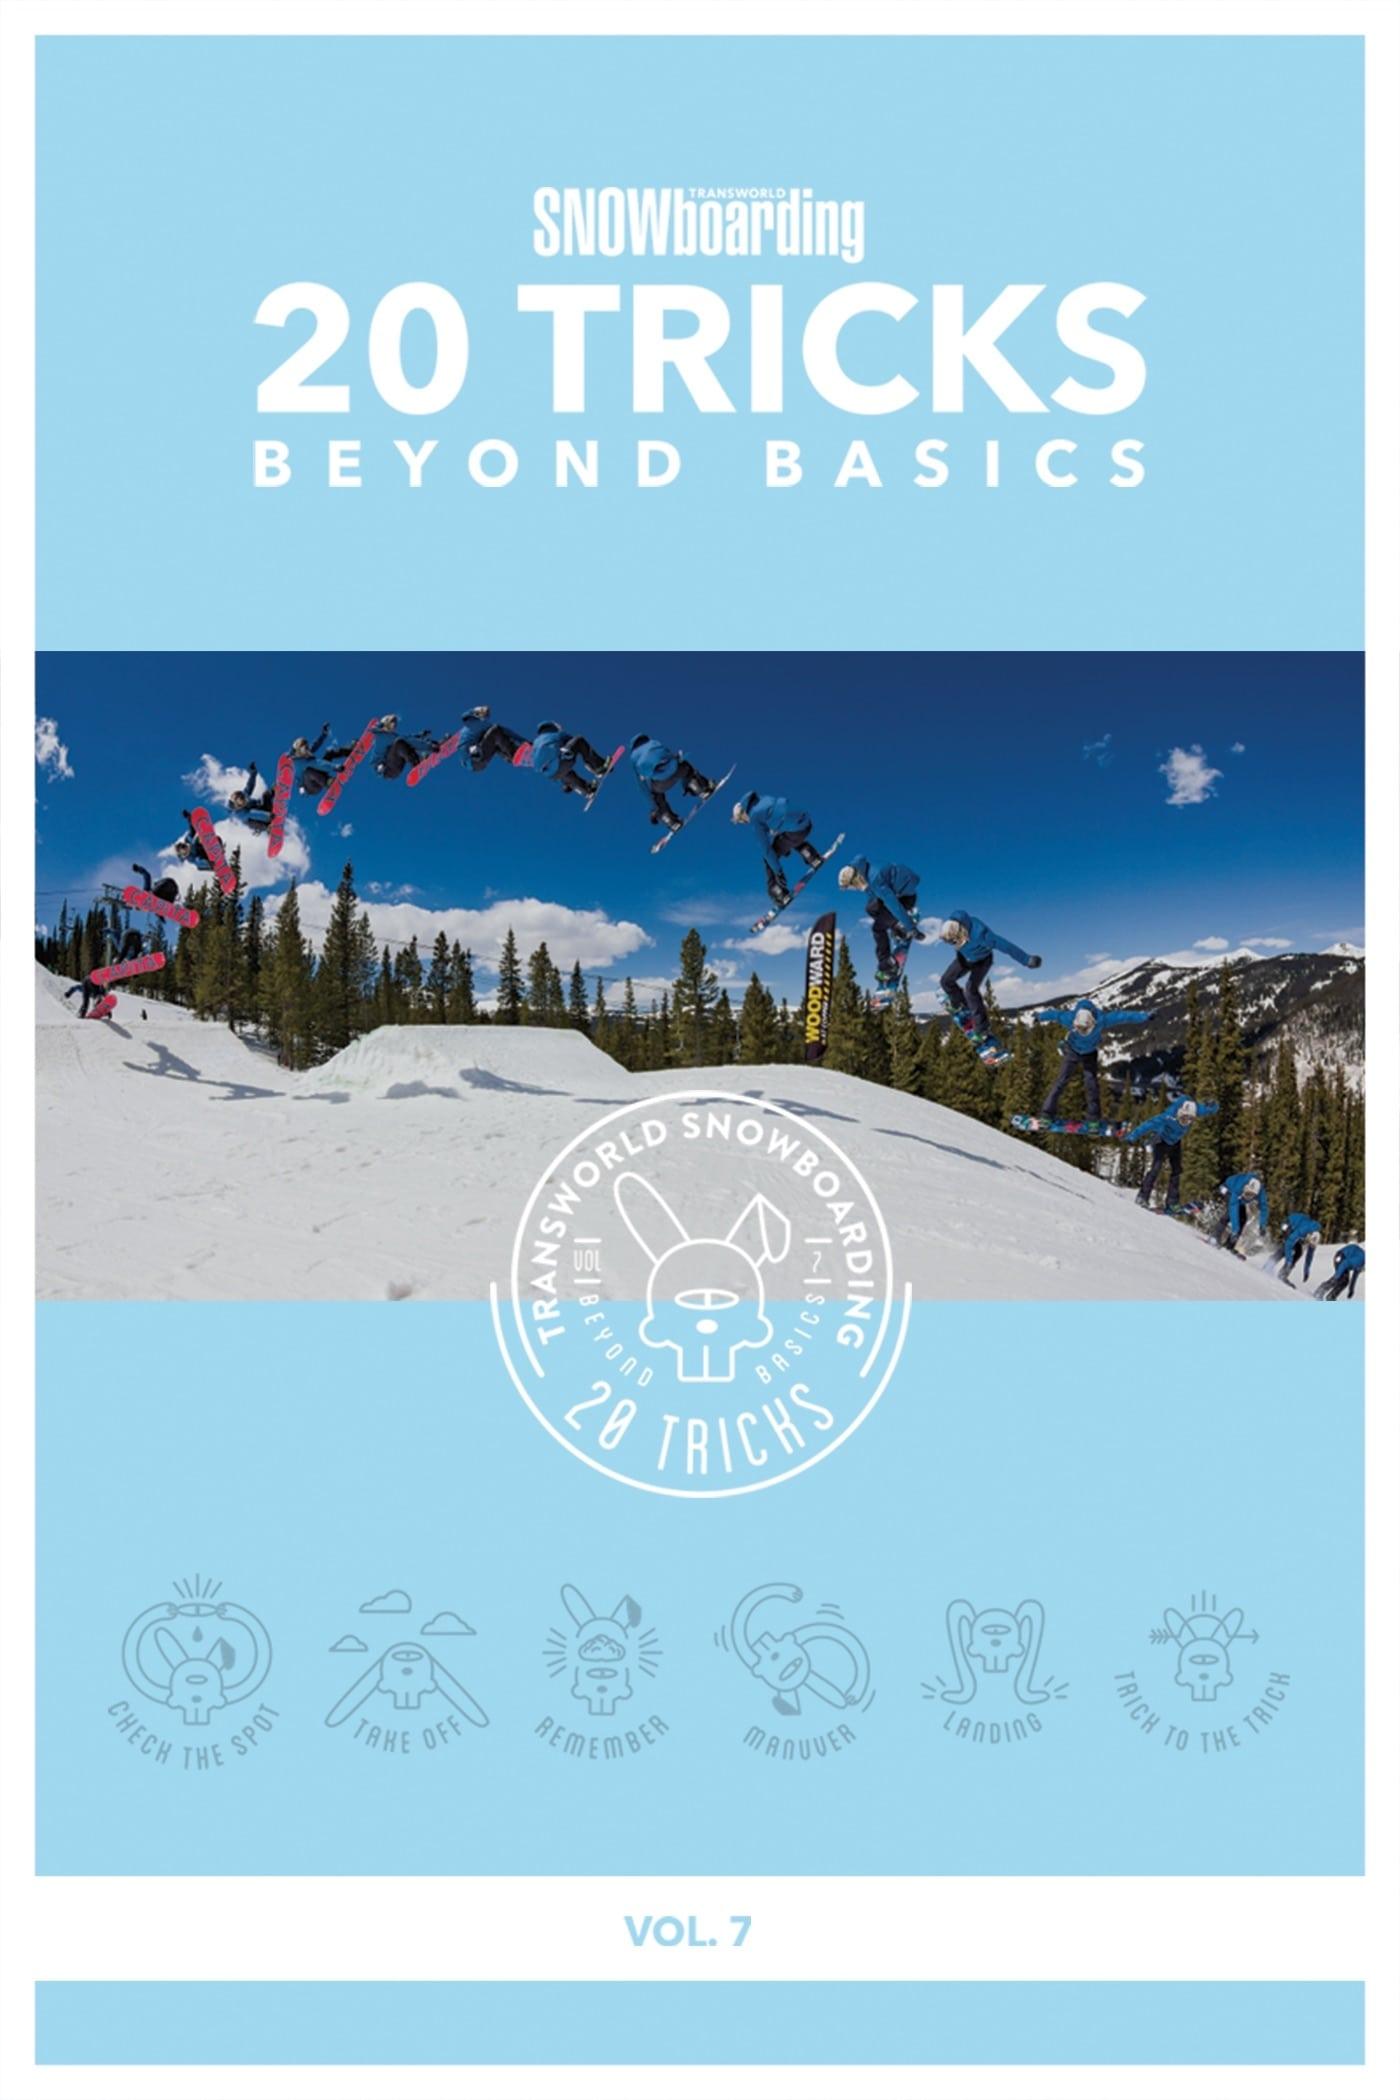 Beyond Basics, Vol. 7 - Transworld Snowboarding 20 Tricks on FREECABLE TV